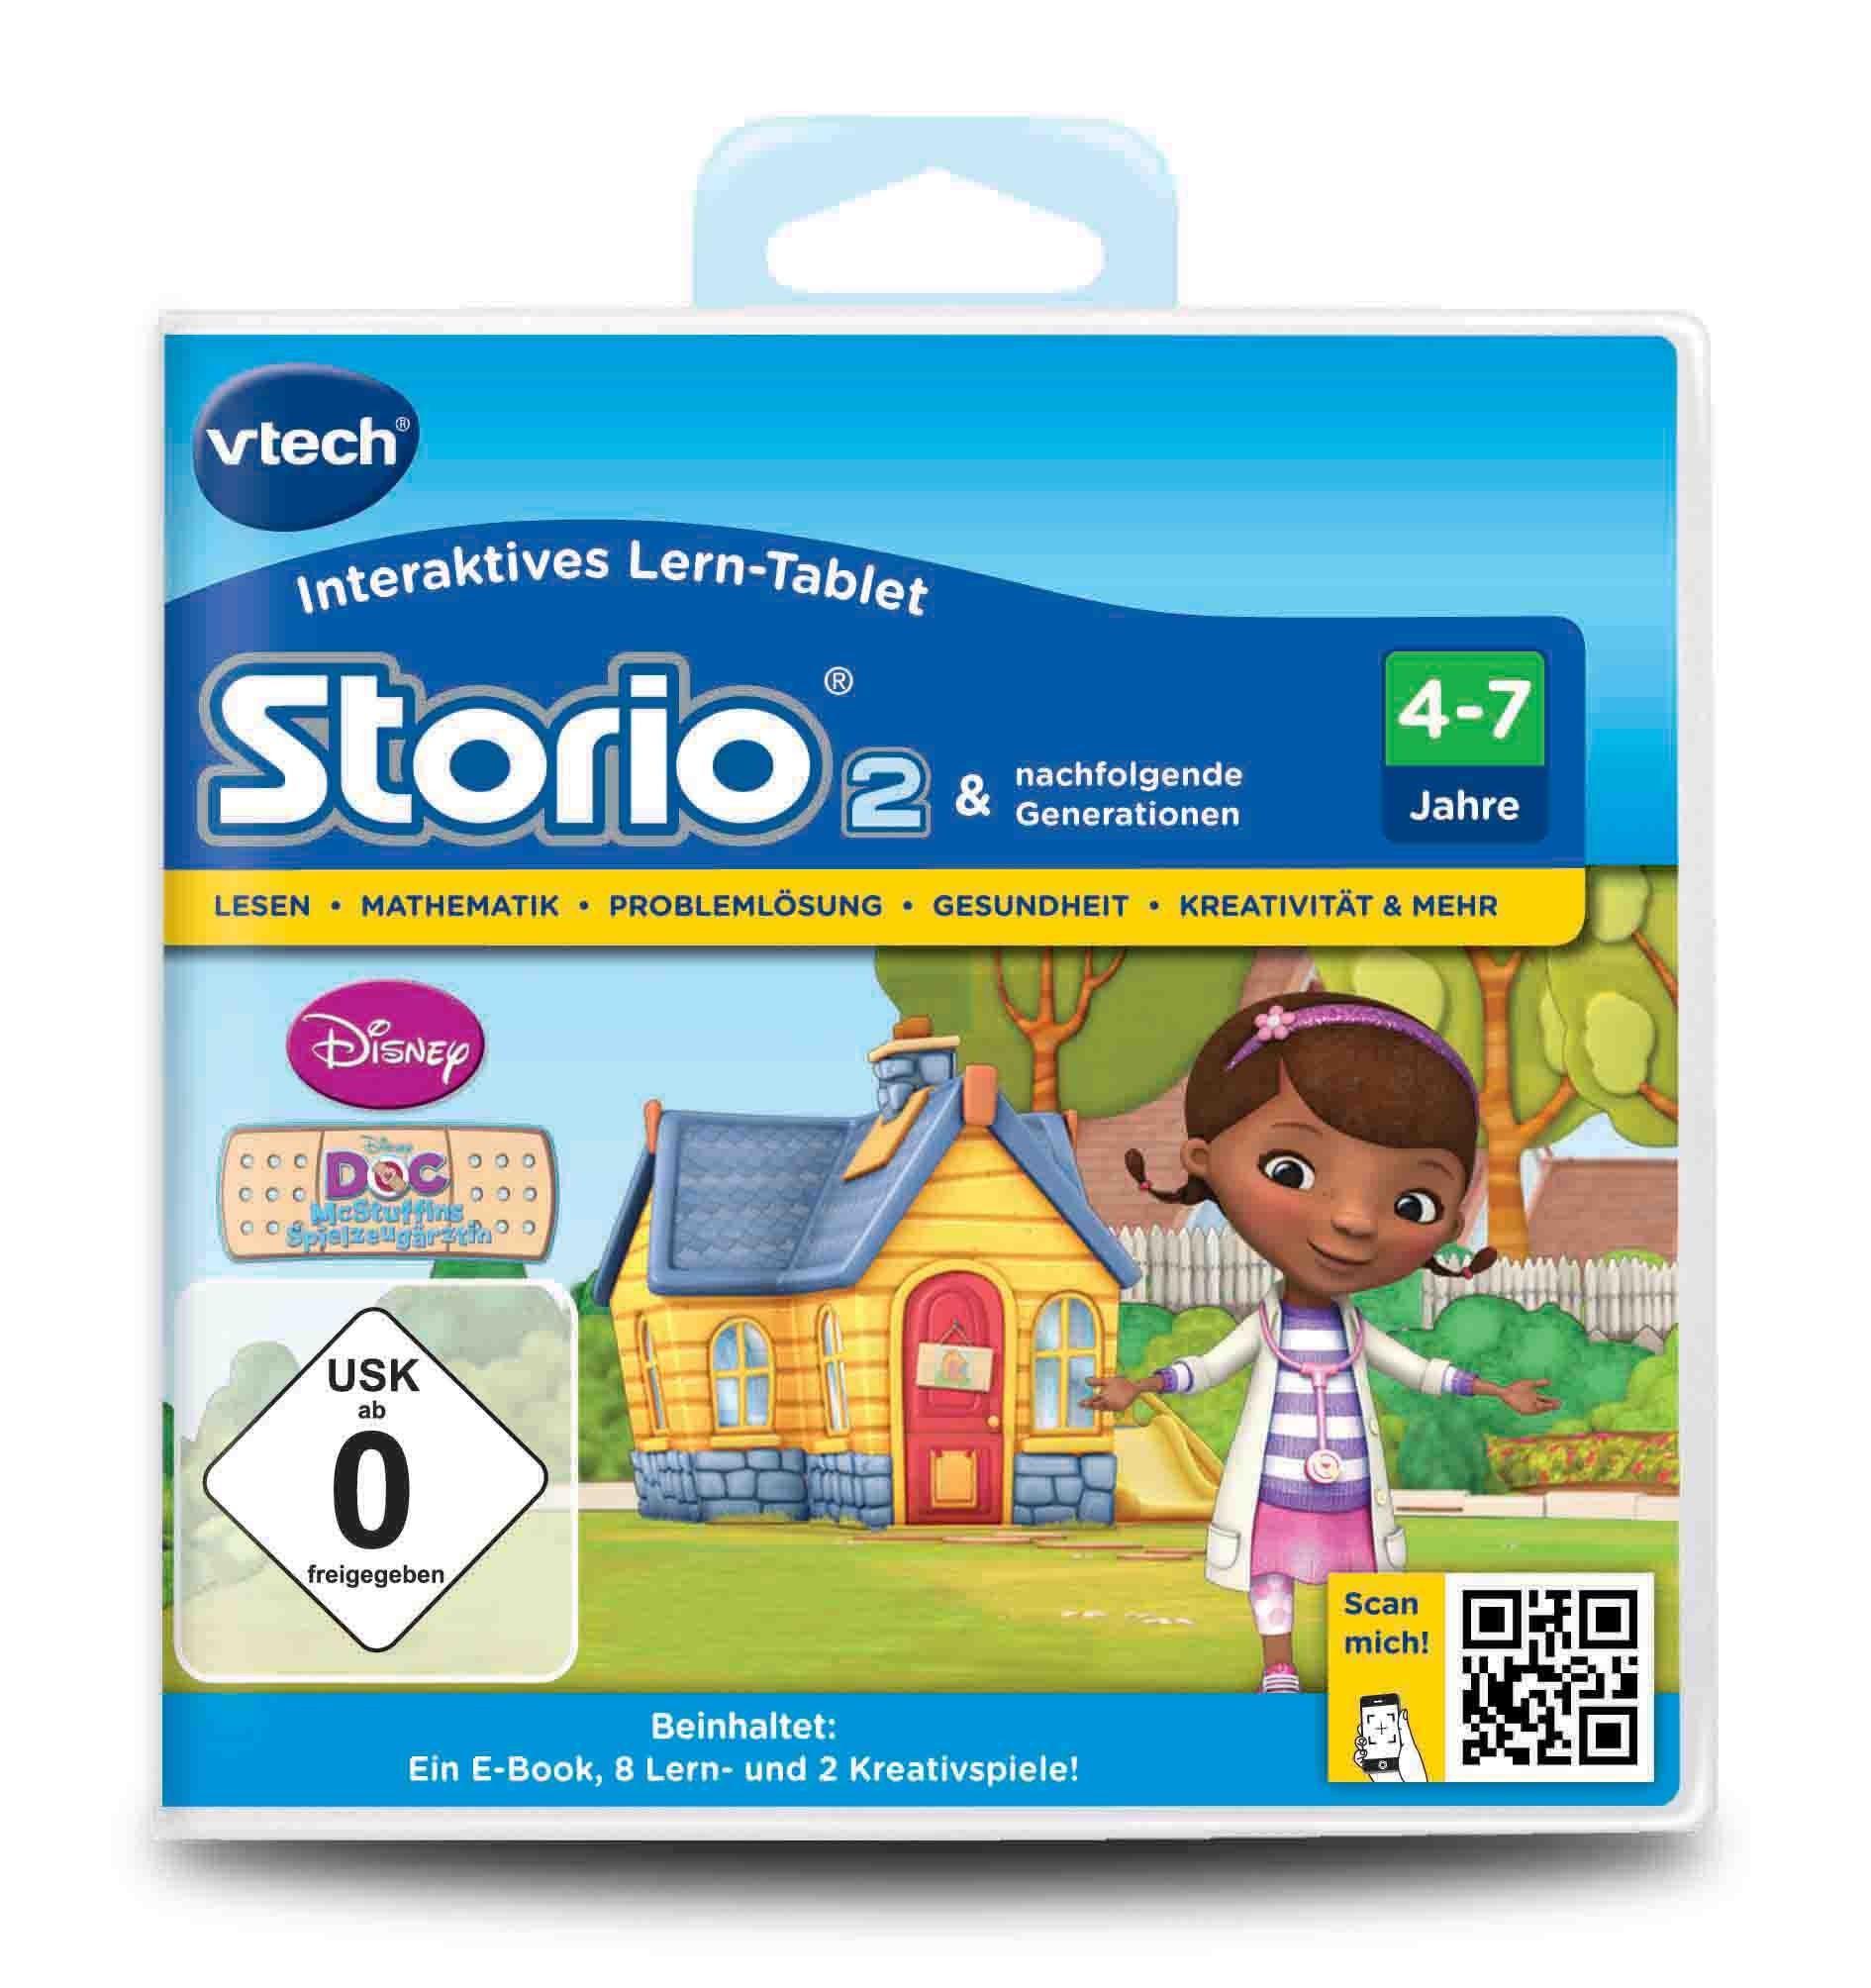 VTech Storio 2 Lernspiel Spielkassette Doc McStuffins